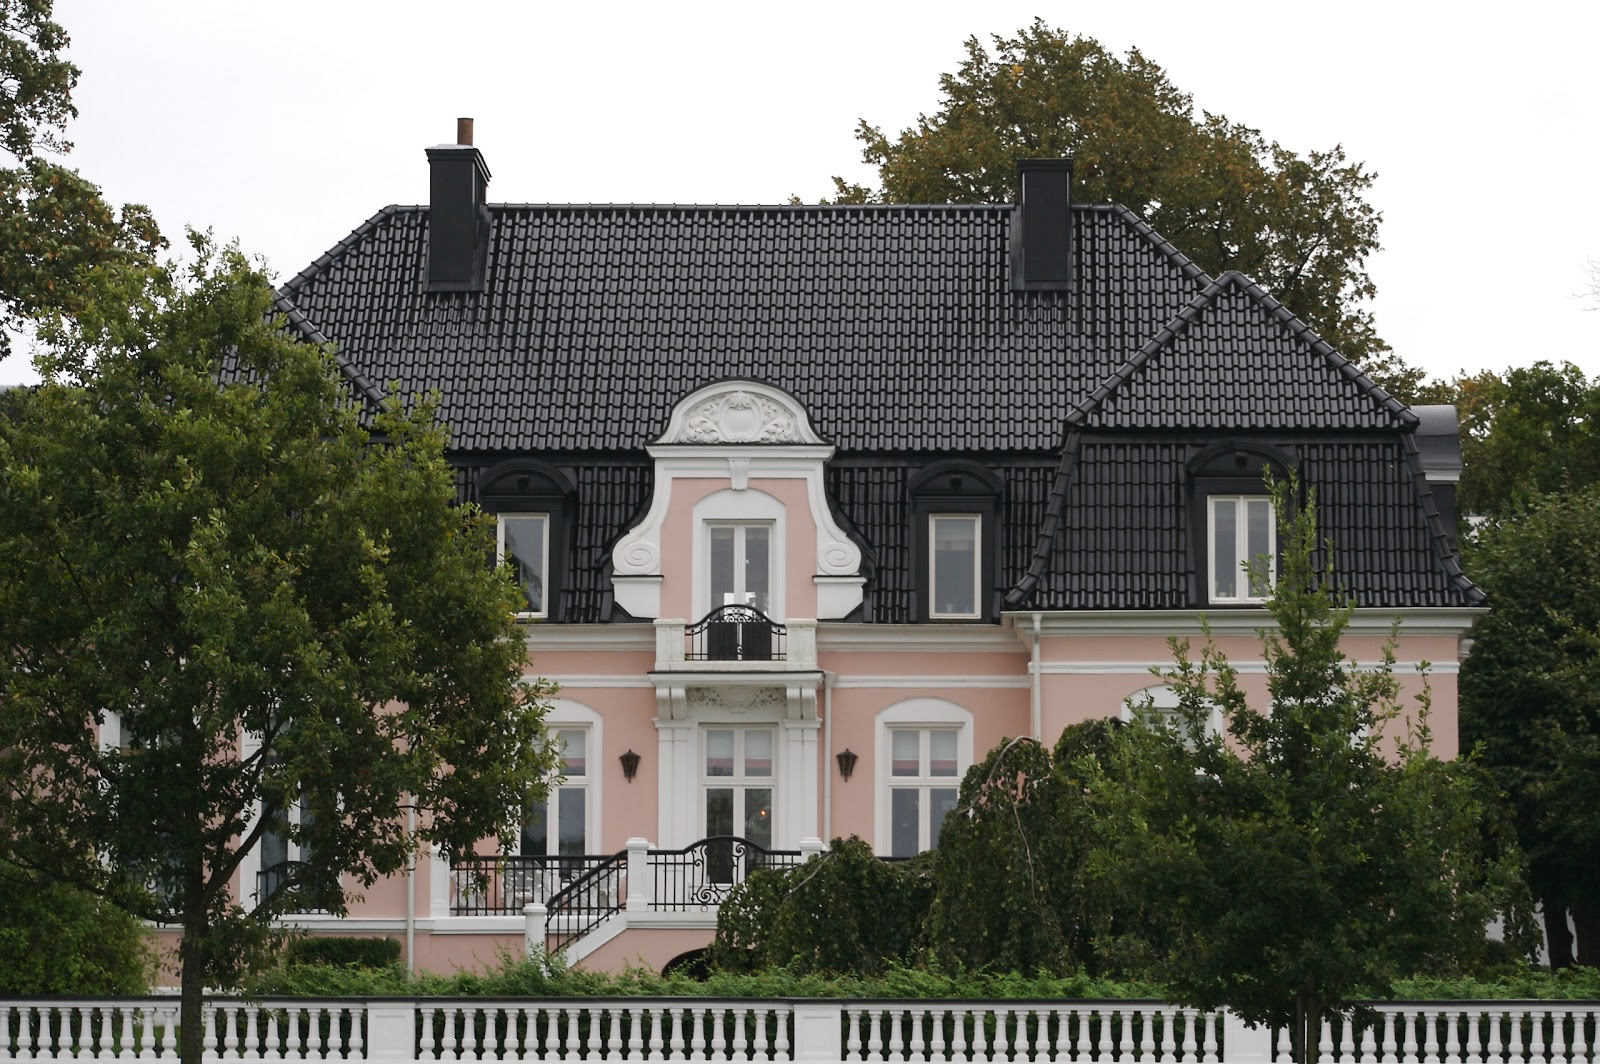 Zlatan Ibrahimovic's House - The Sport and Football Report